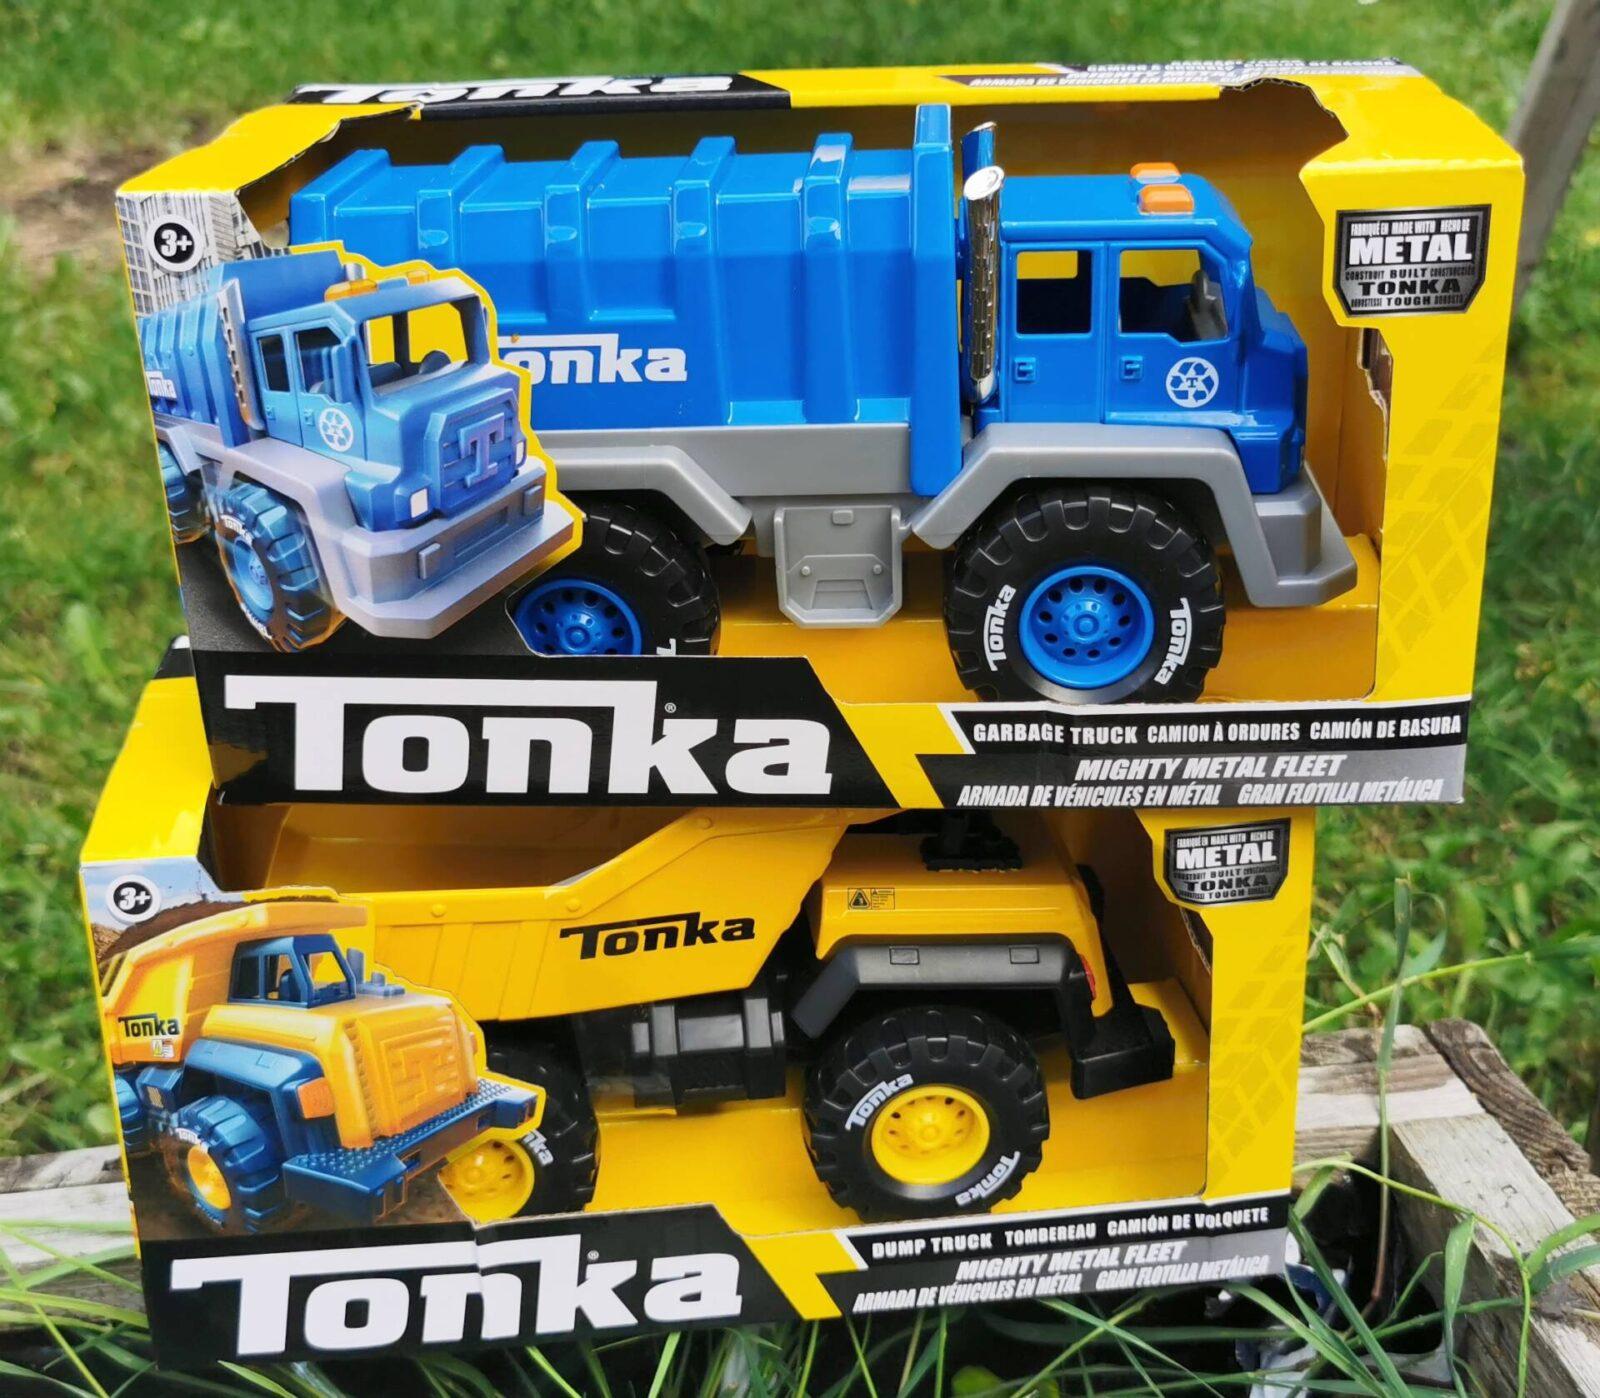 Tonka Mighty Metal Fleet – Dump Truck and Garbage Truck